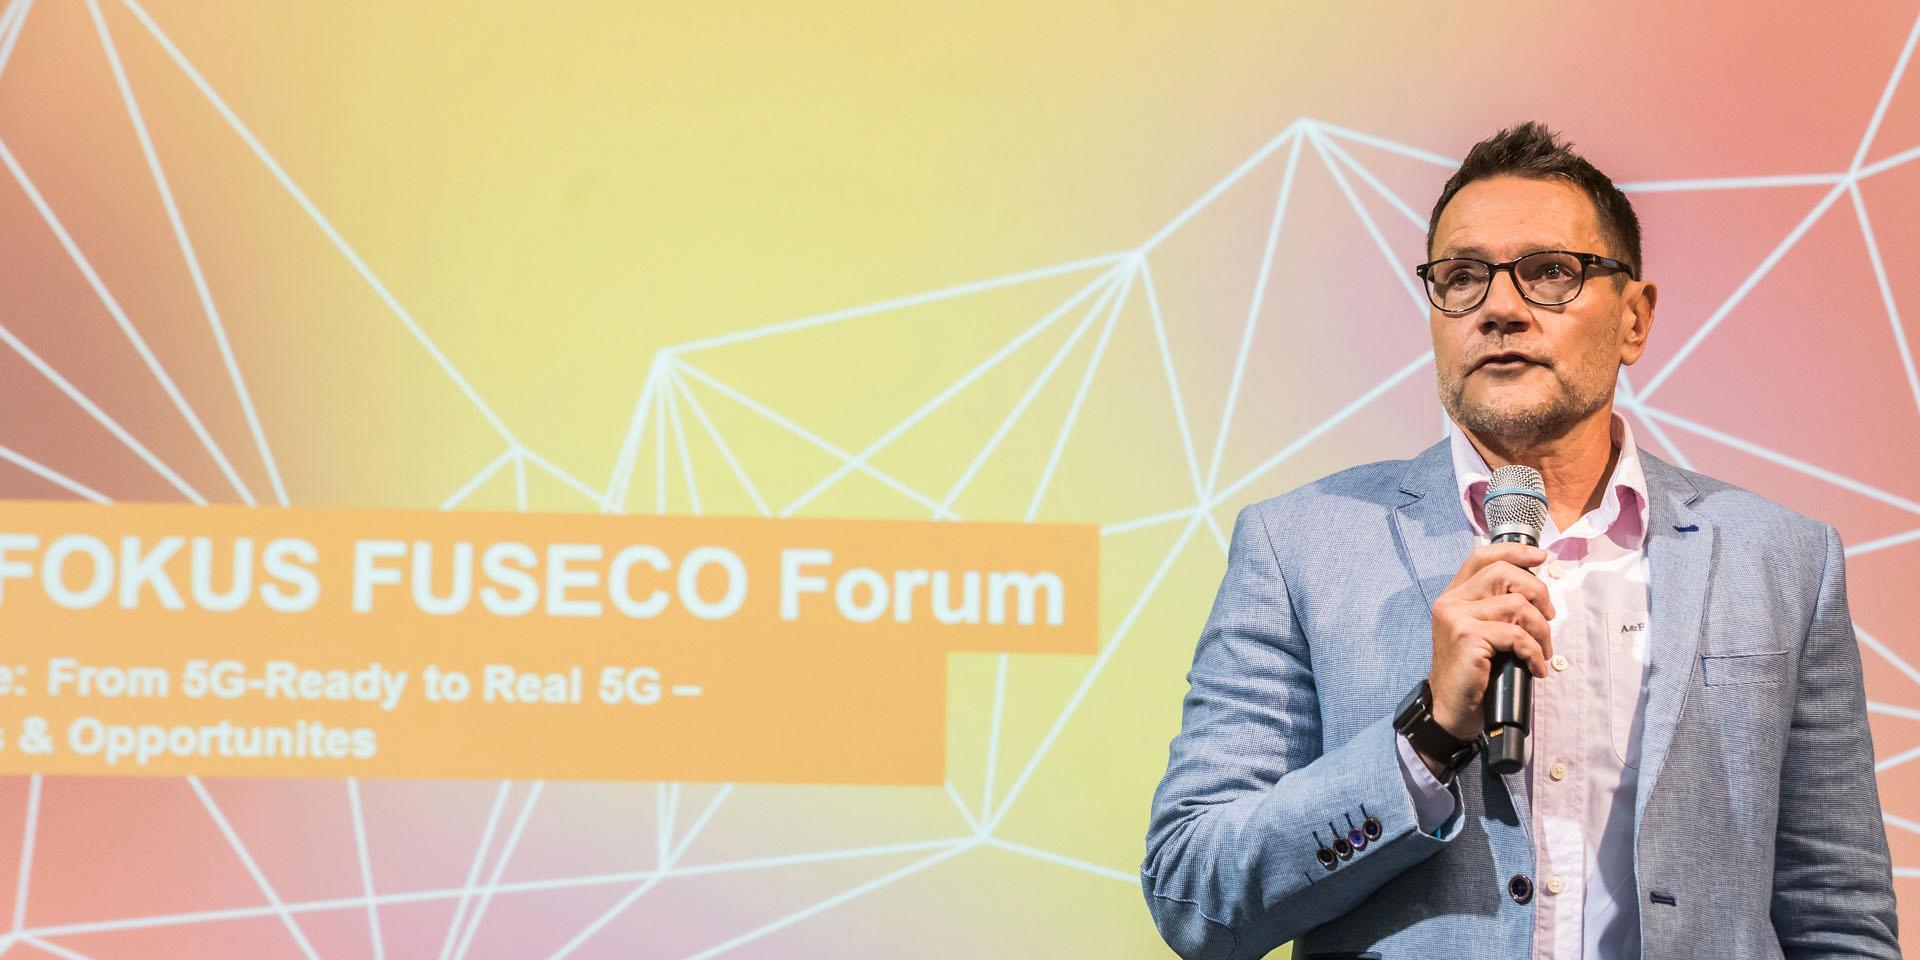 FOKUS Fuseco Forum 2019 Impression 2